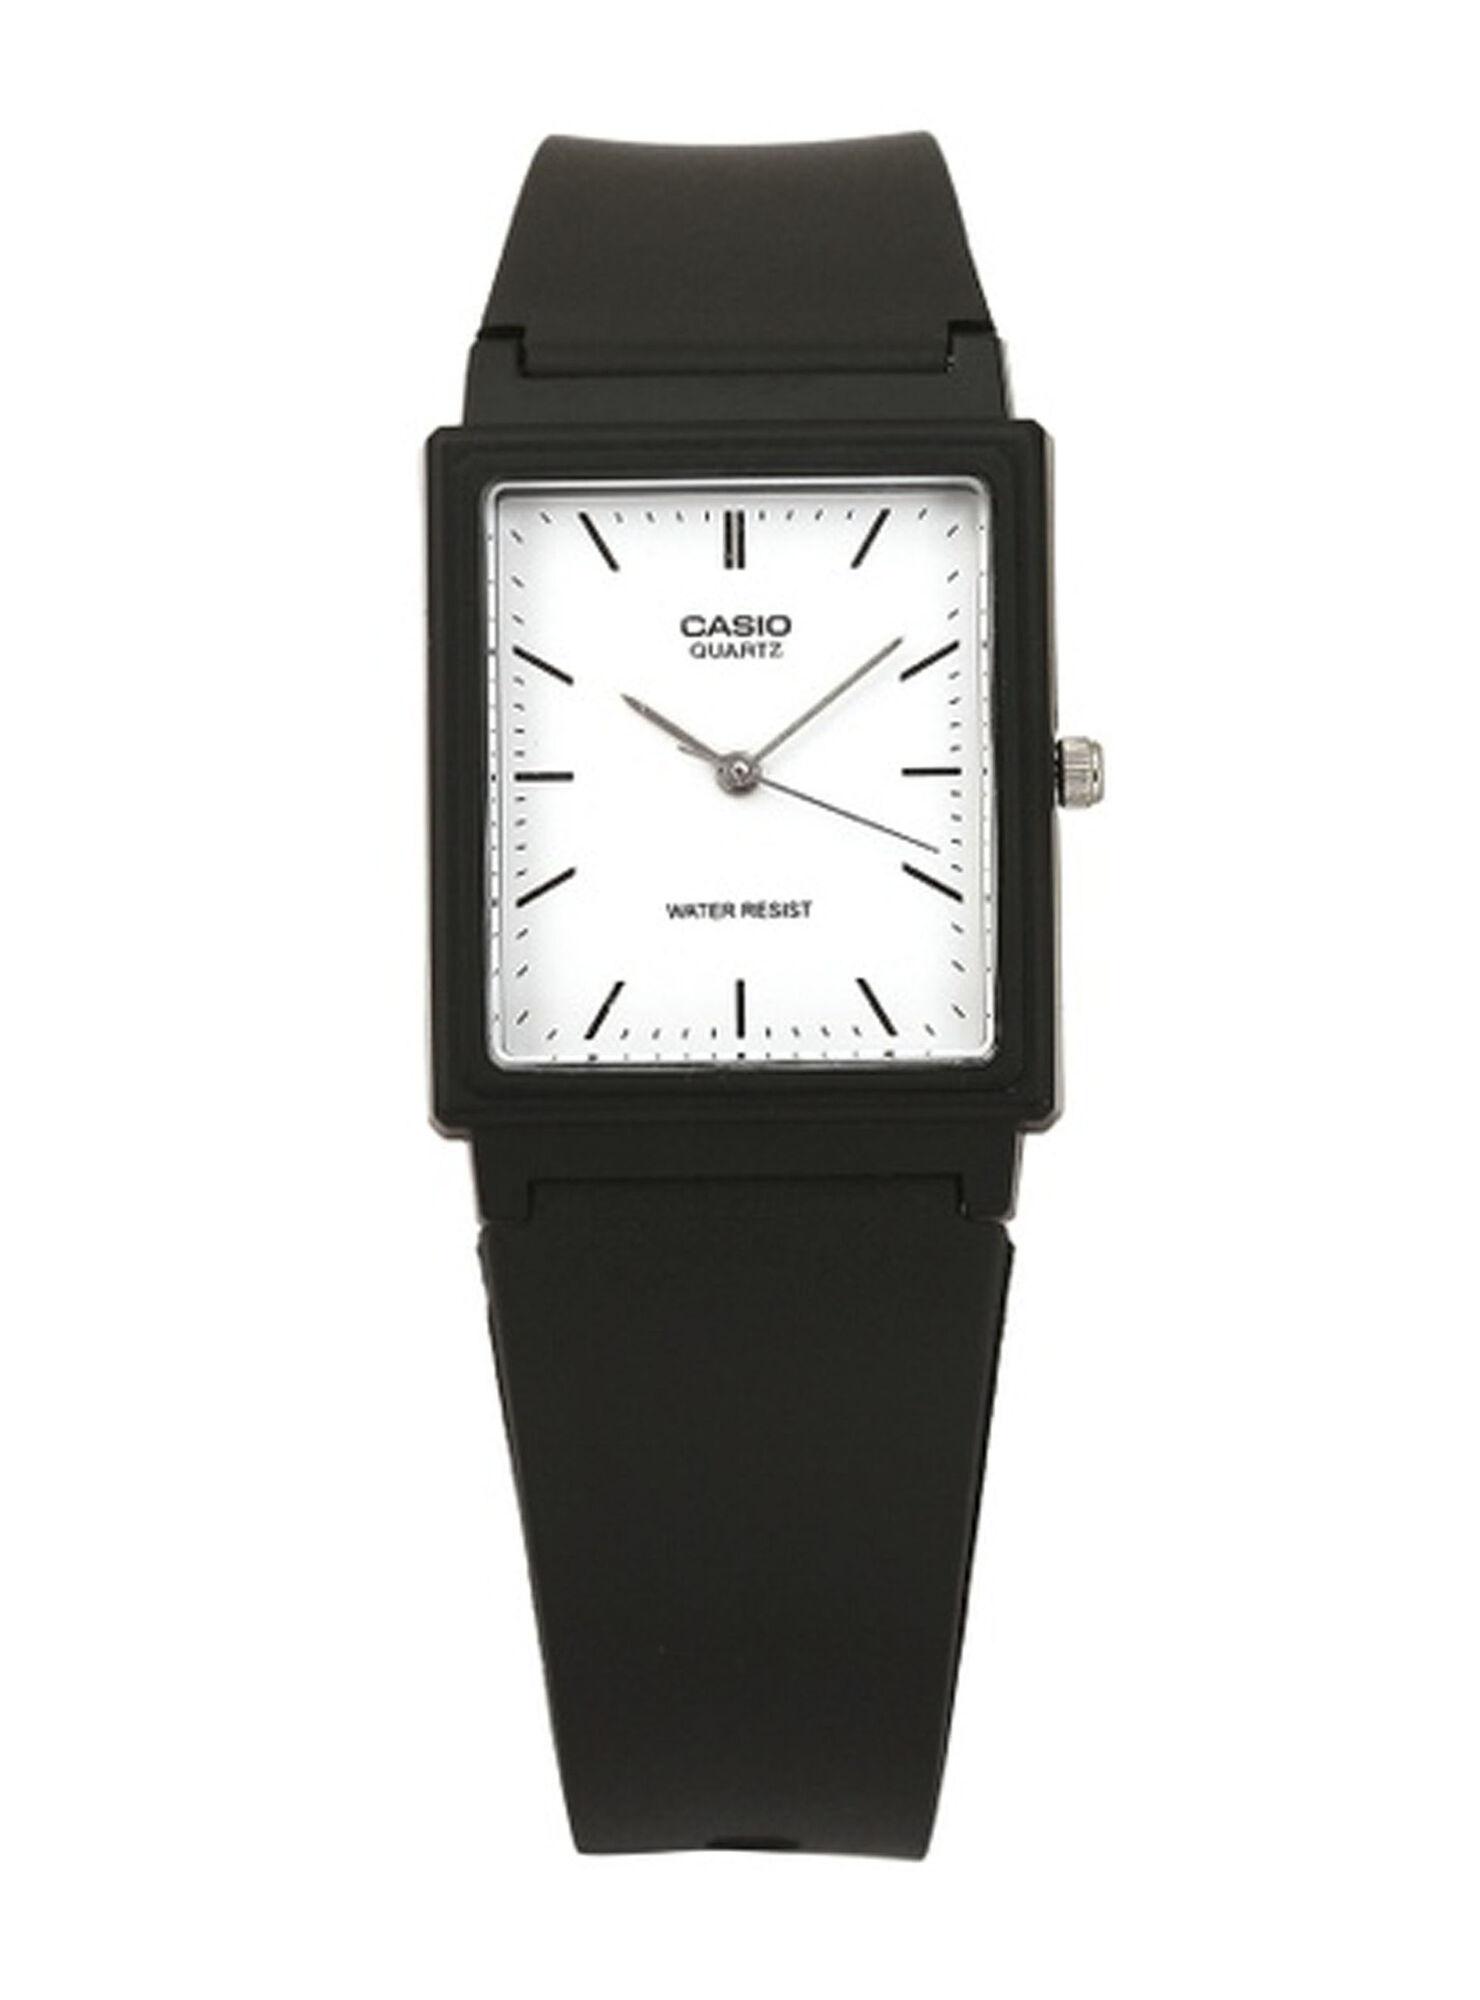 936b10b4a2d1 Reloj Hombre Análogo Mq- Casio en Relojes